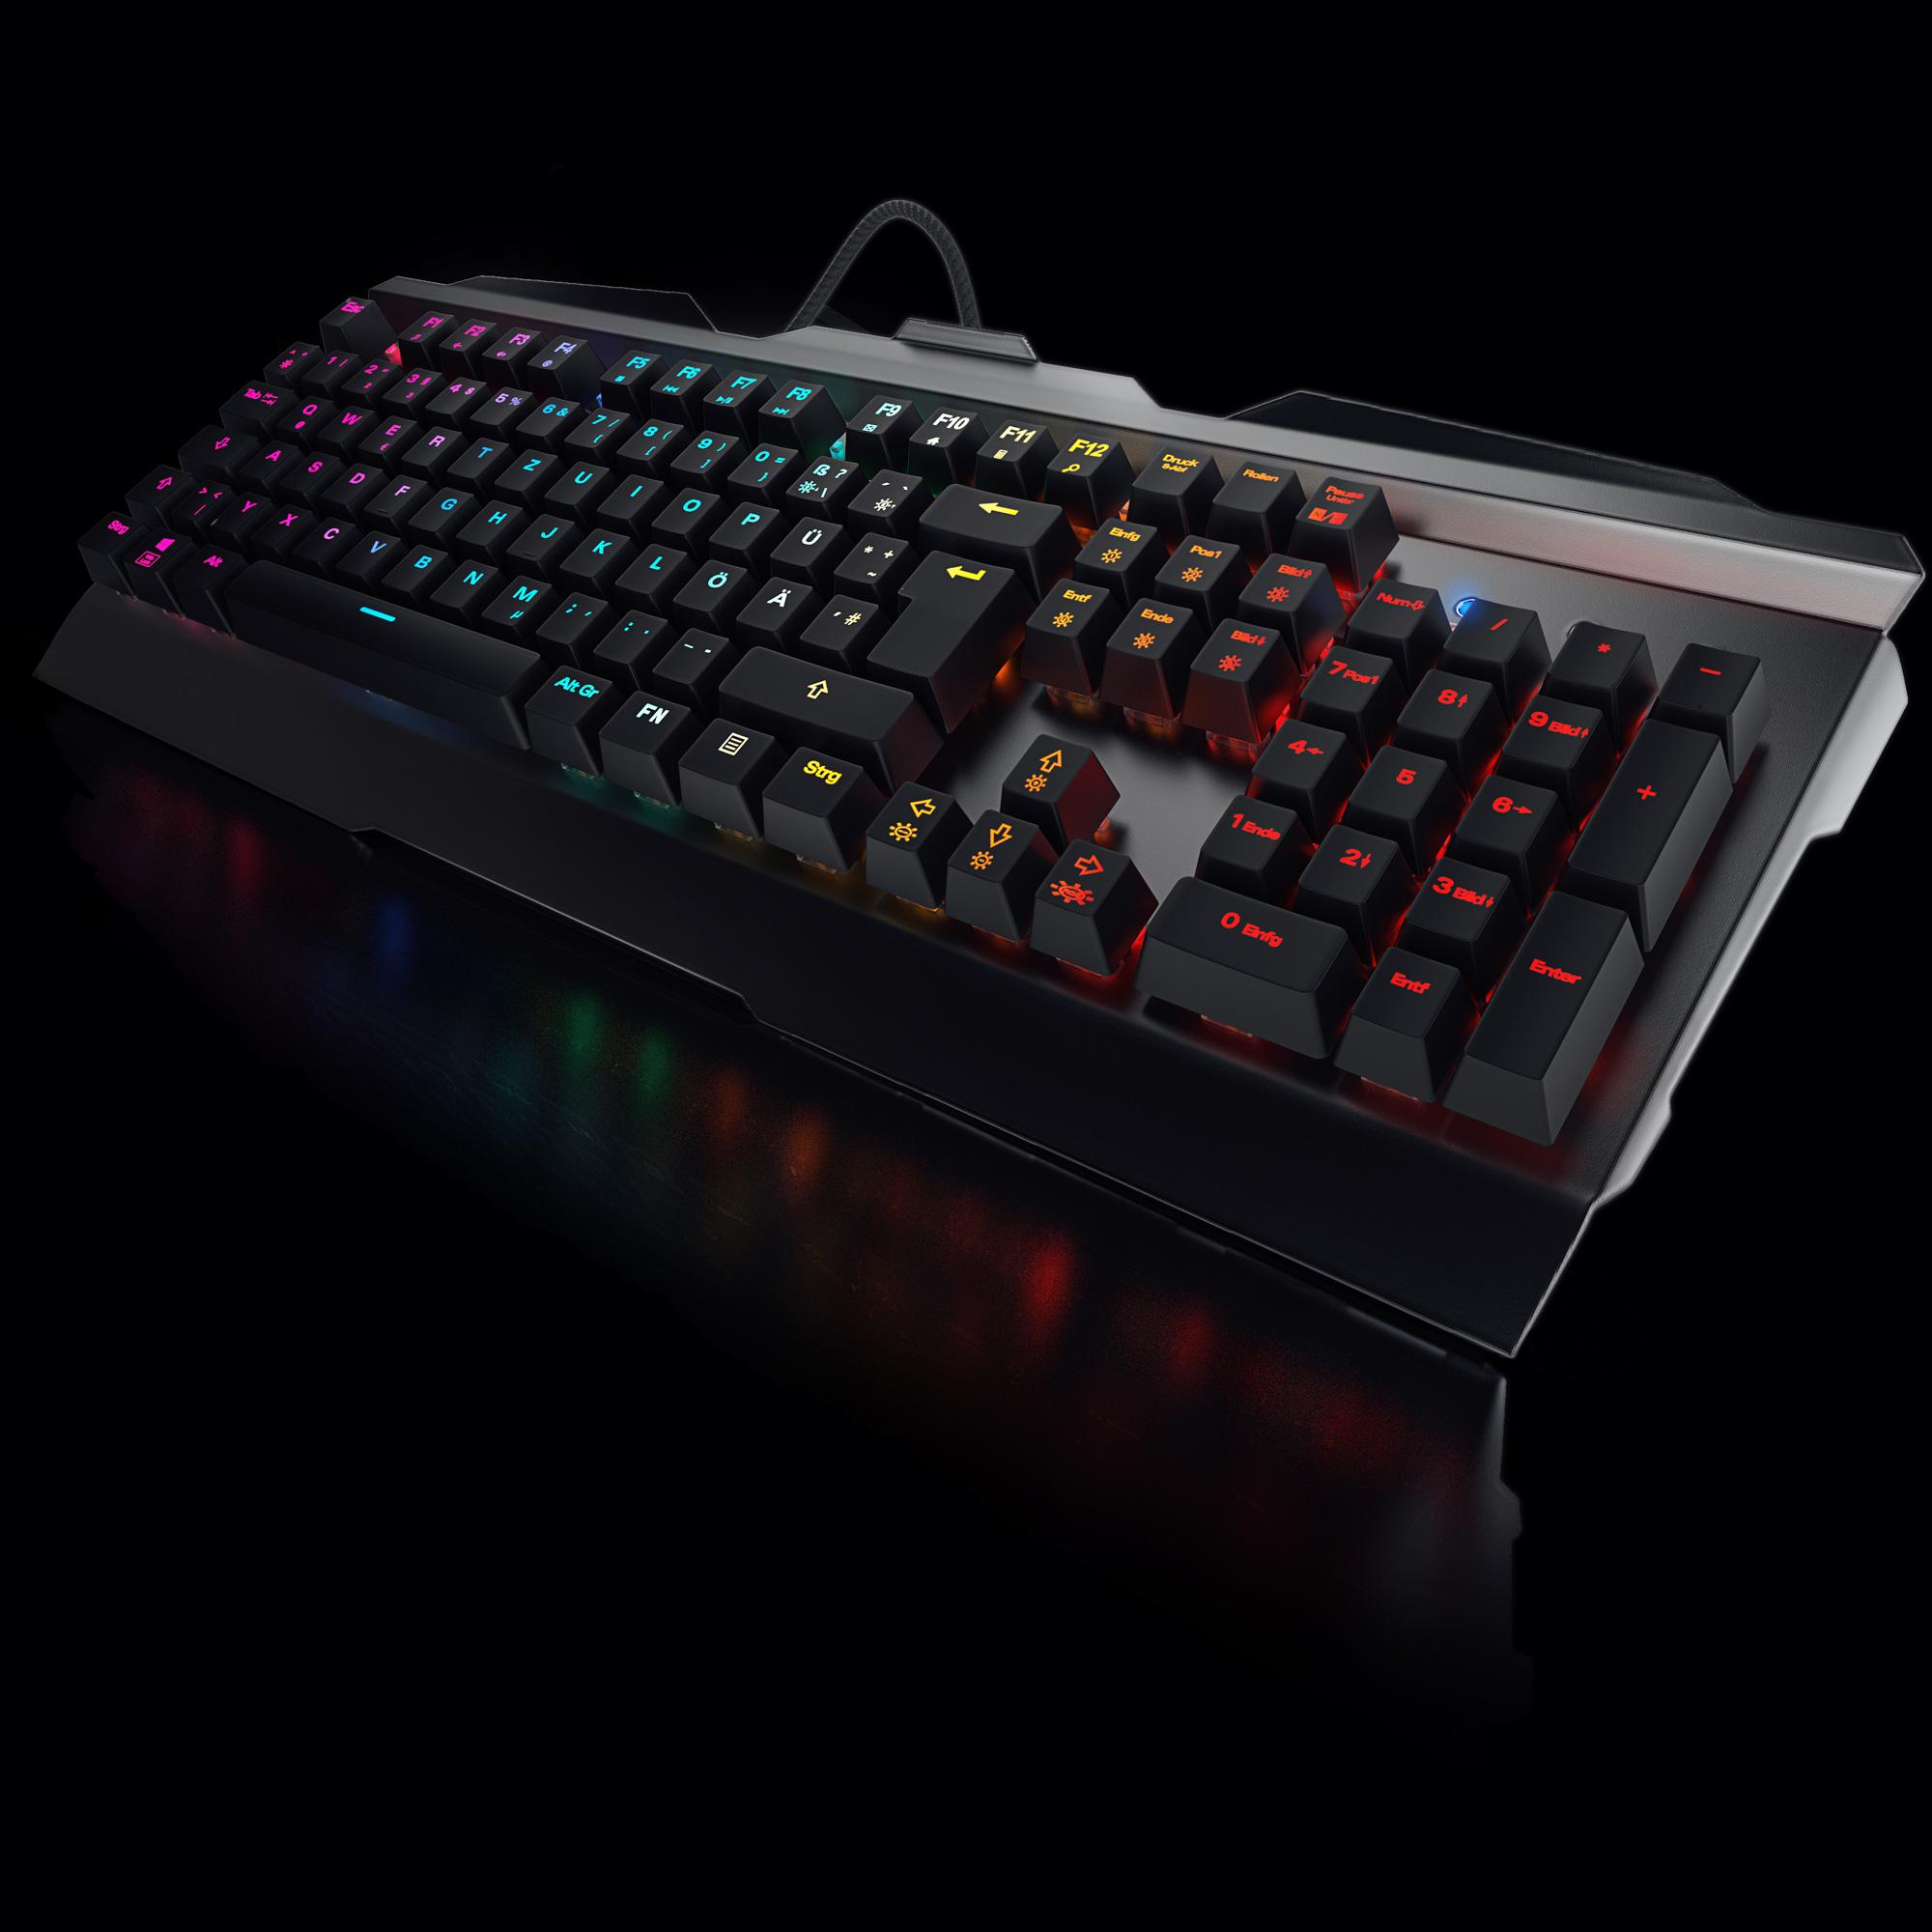 302558-Invader-Galerie-NEU-V2-black.jpg